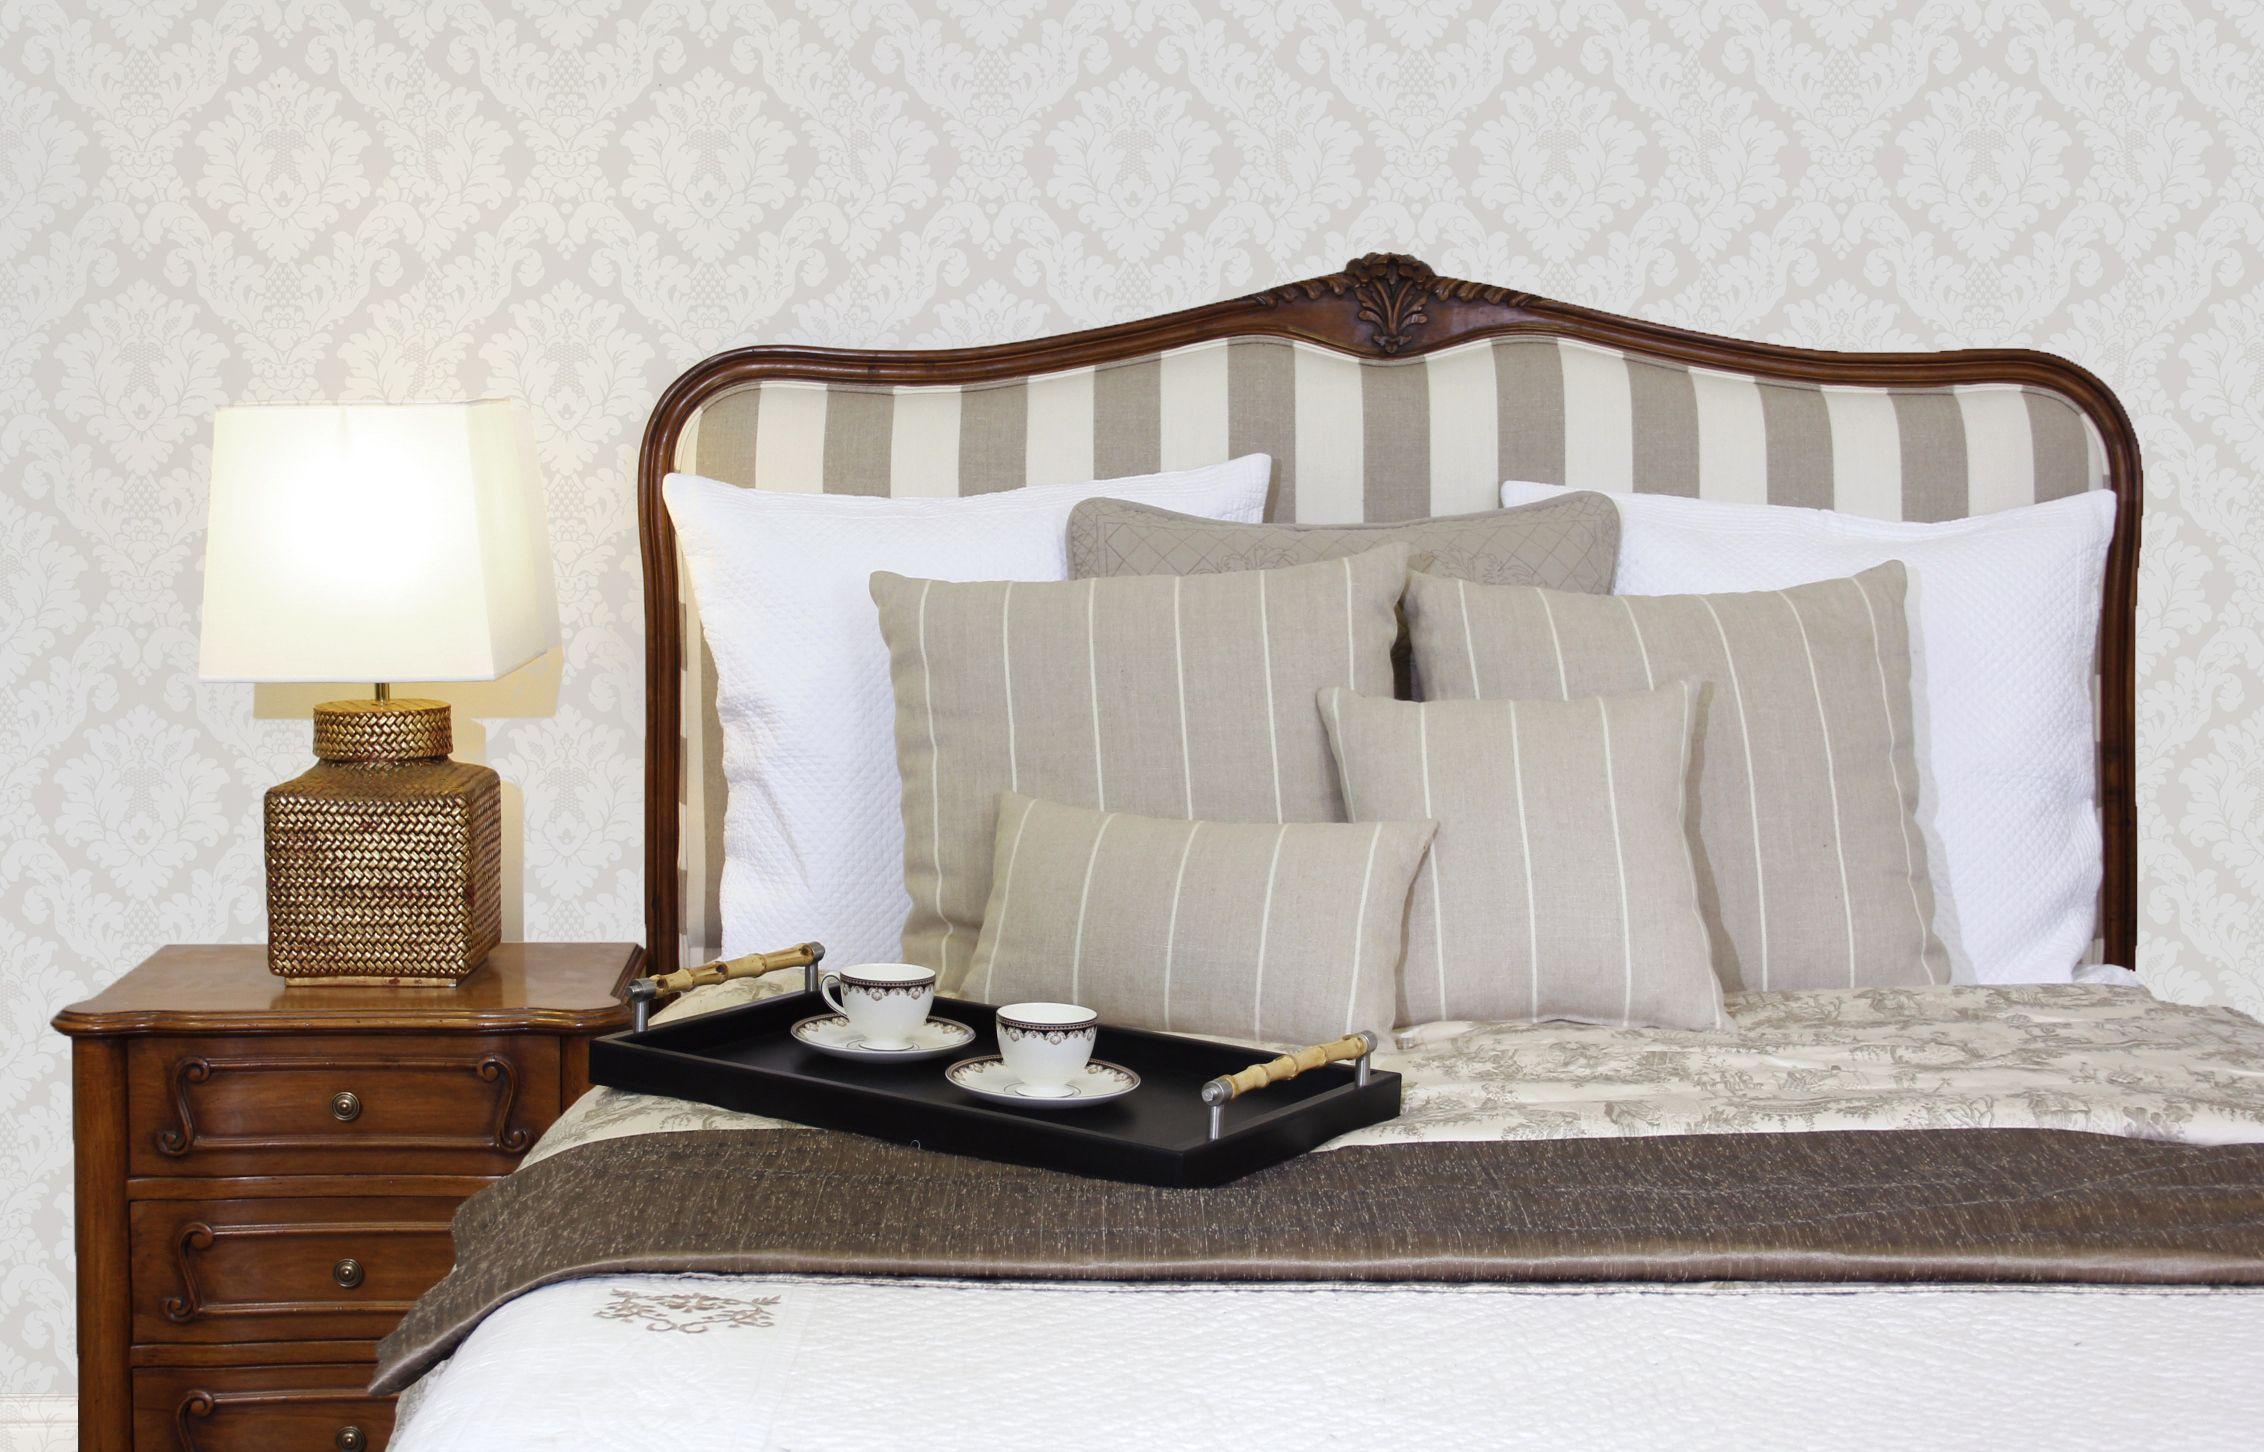 The Portia upholstered headboard custom made from bedhead design. Hand carved European beach frame www.bedheaddesign.com.au